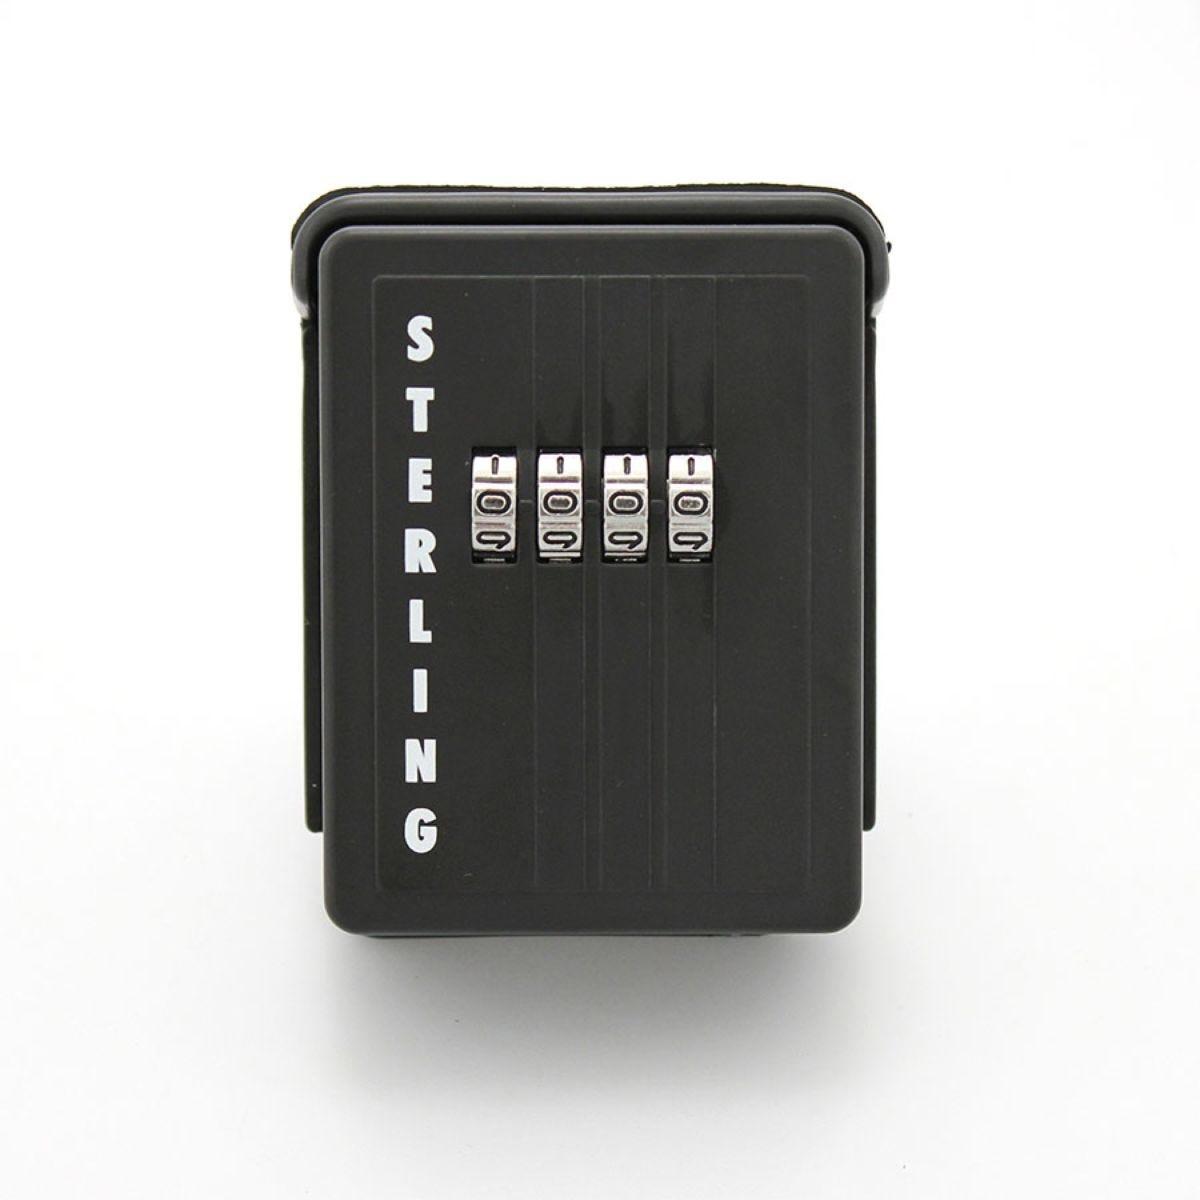 Sterling KM1 Combination Locking Key Minder - Small